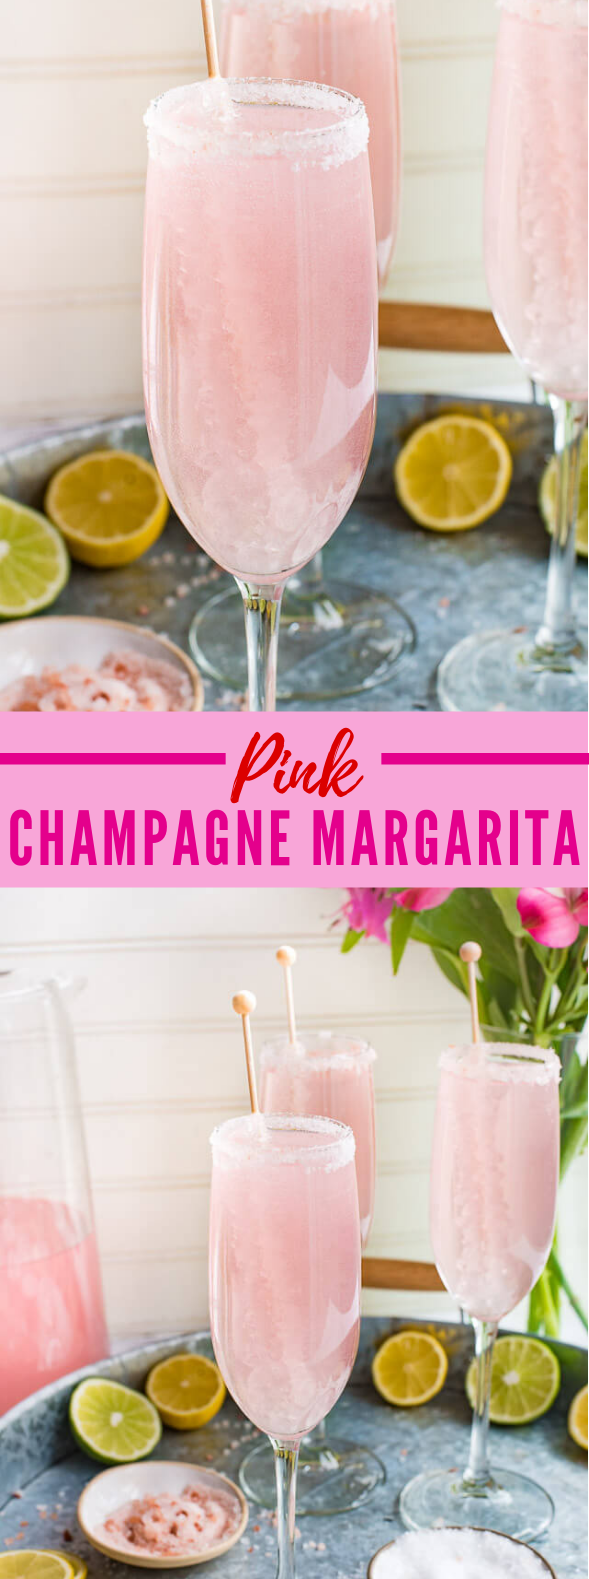 PINK CHAMPAGNE MARGARITA #drink #partydrink